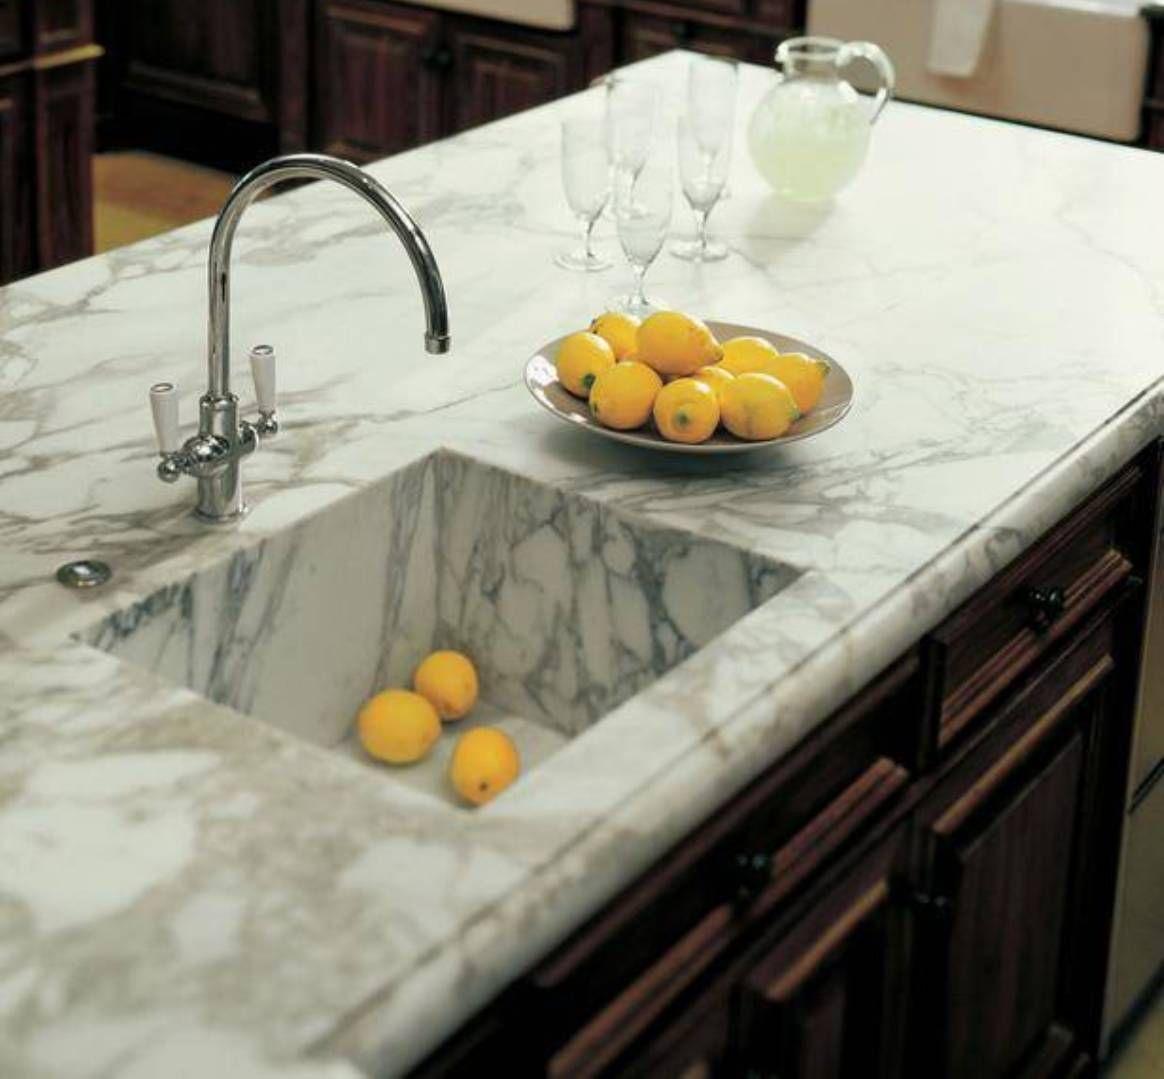 Kitchen Countertops And Sinks: Kitchen , Best Kitchen Countertops Options : Marble